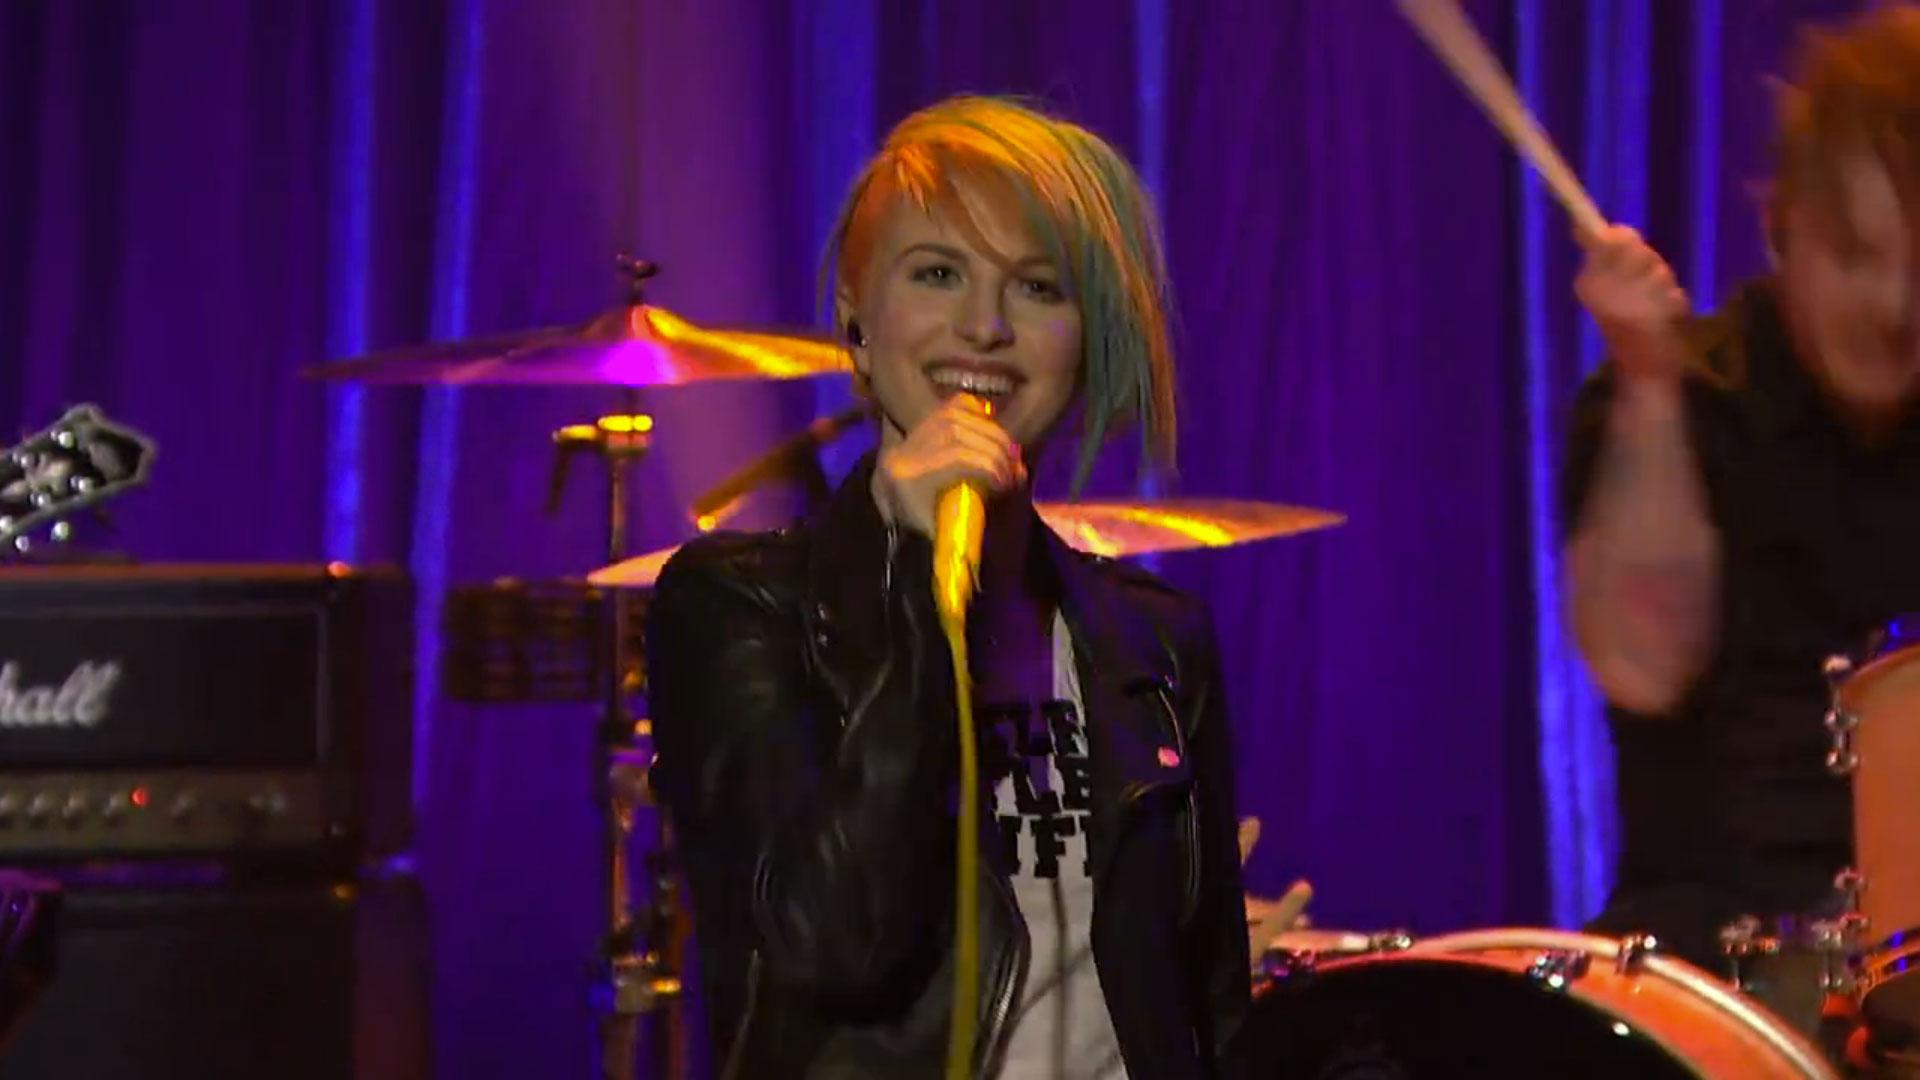 Watch Paramore Play &#8220;Ain&#8217;t It Fun&#8221; On <em>Seth Meyers</em>, Hear The Dutch Uncles Remix